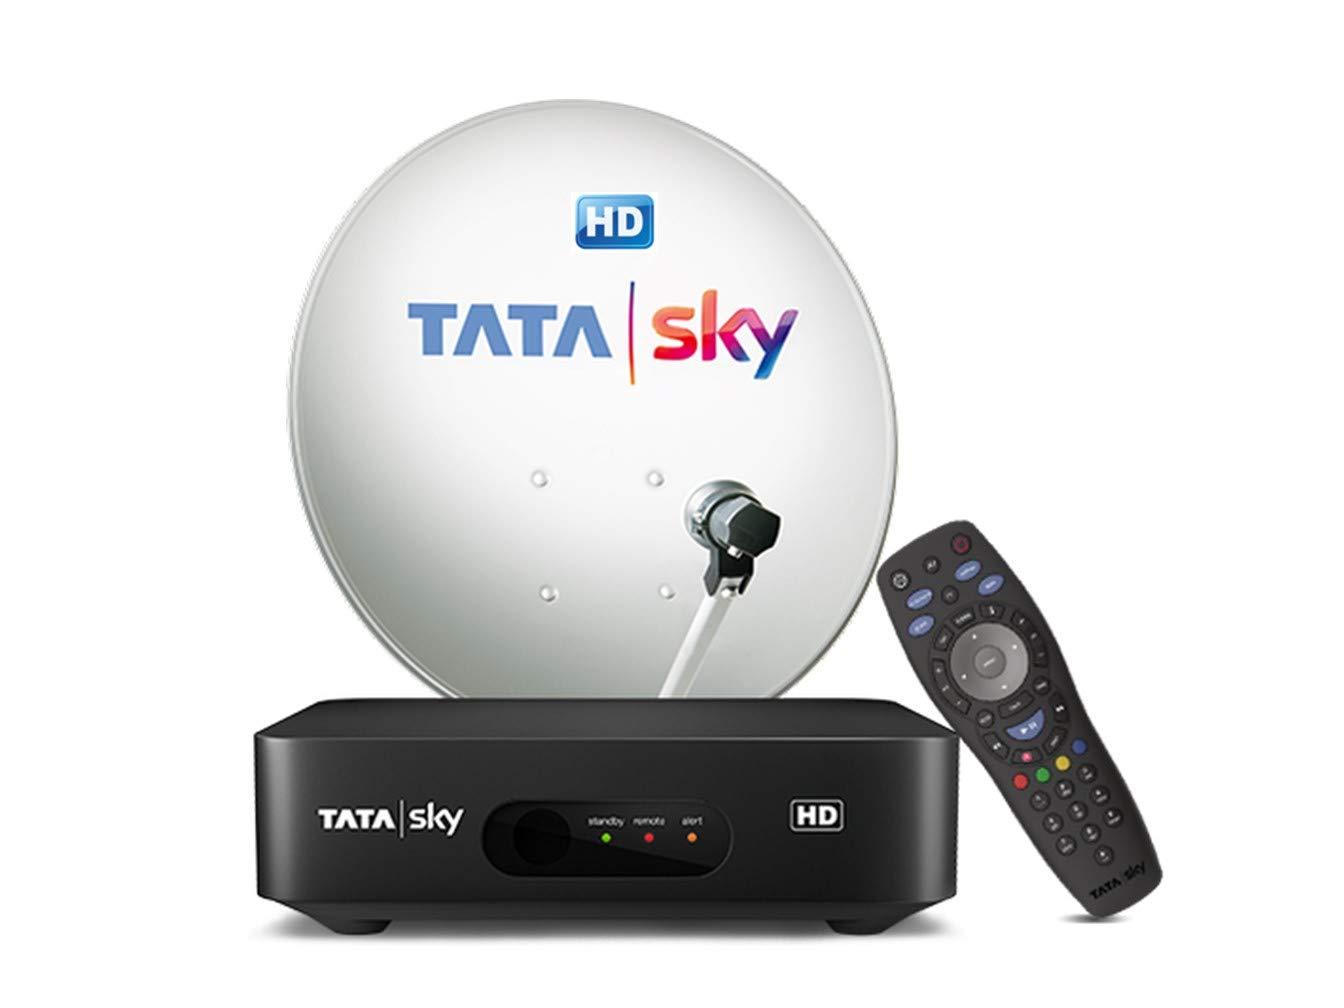 Tata Sky Hd Set Top Box 1 Month Hd Family Kids Sports Amazon In Electronics